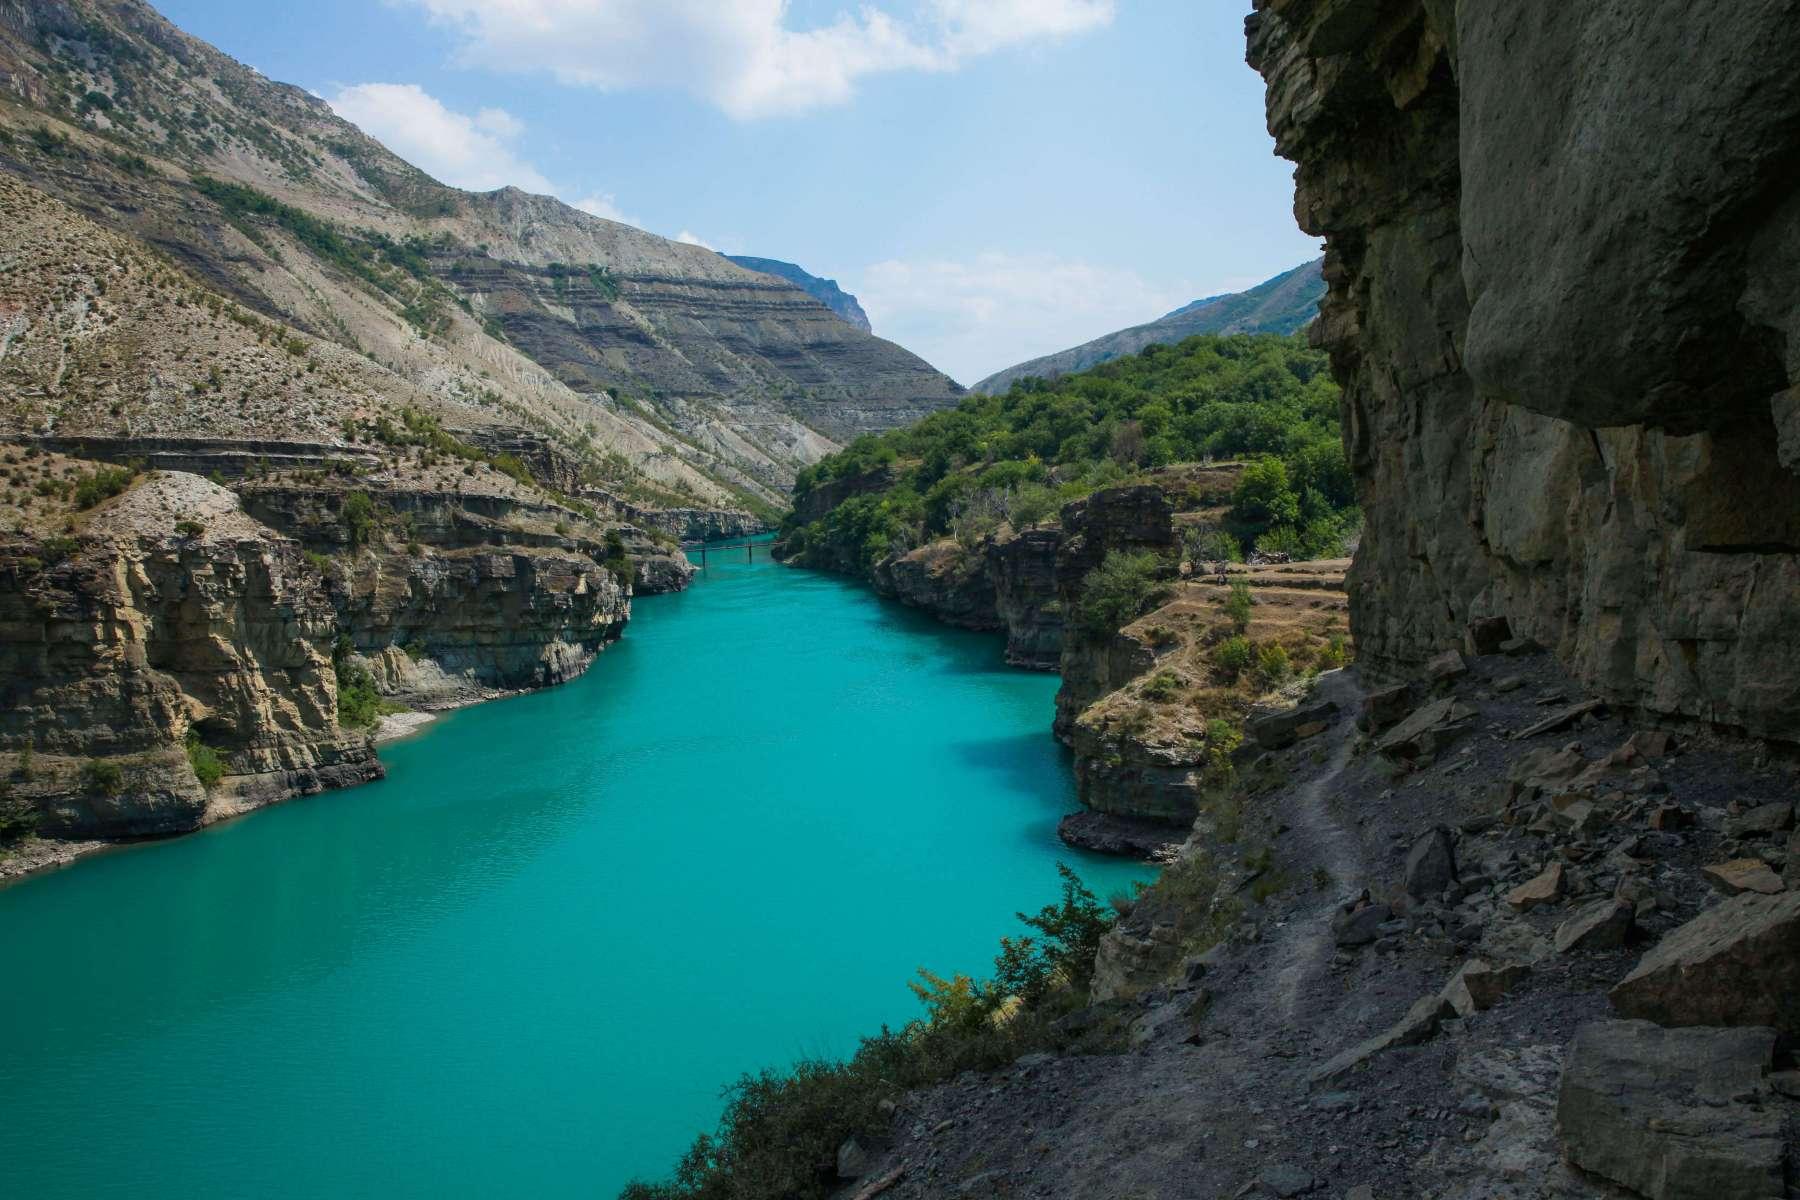 sulakskij-kanyon